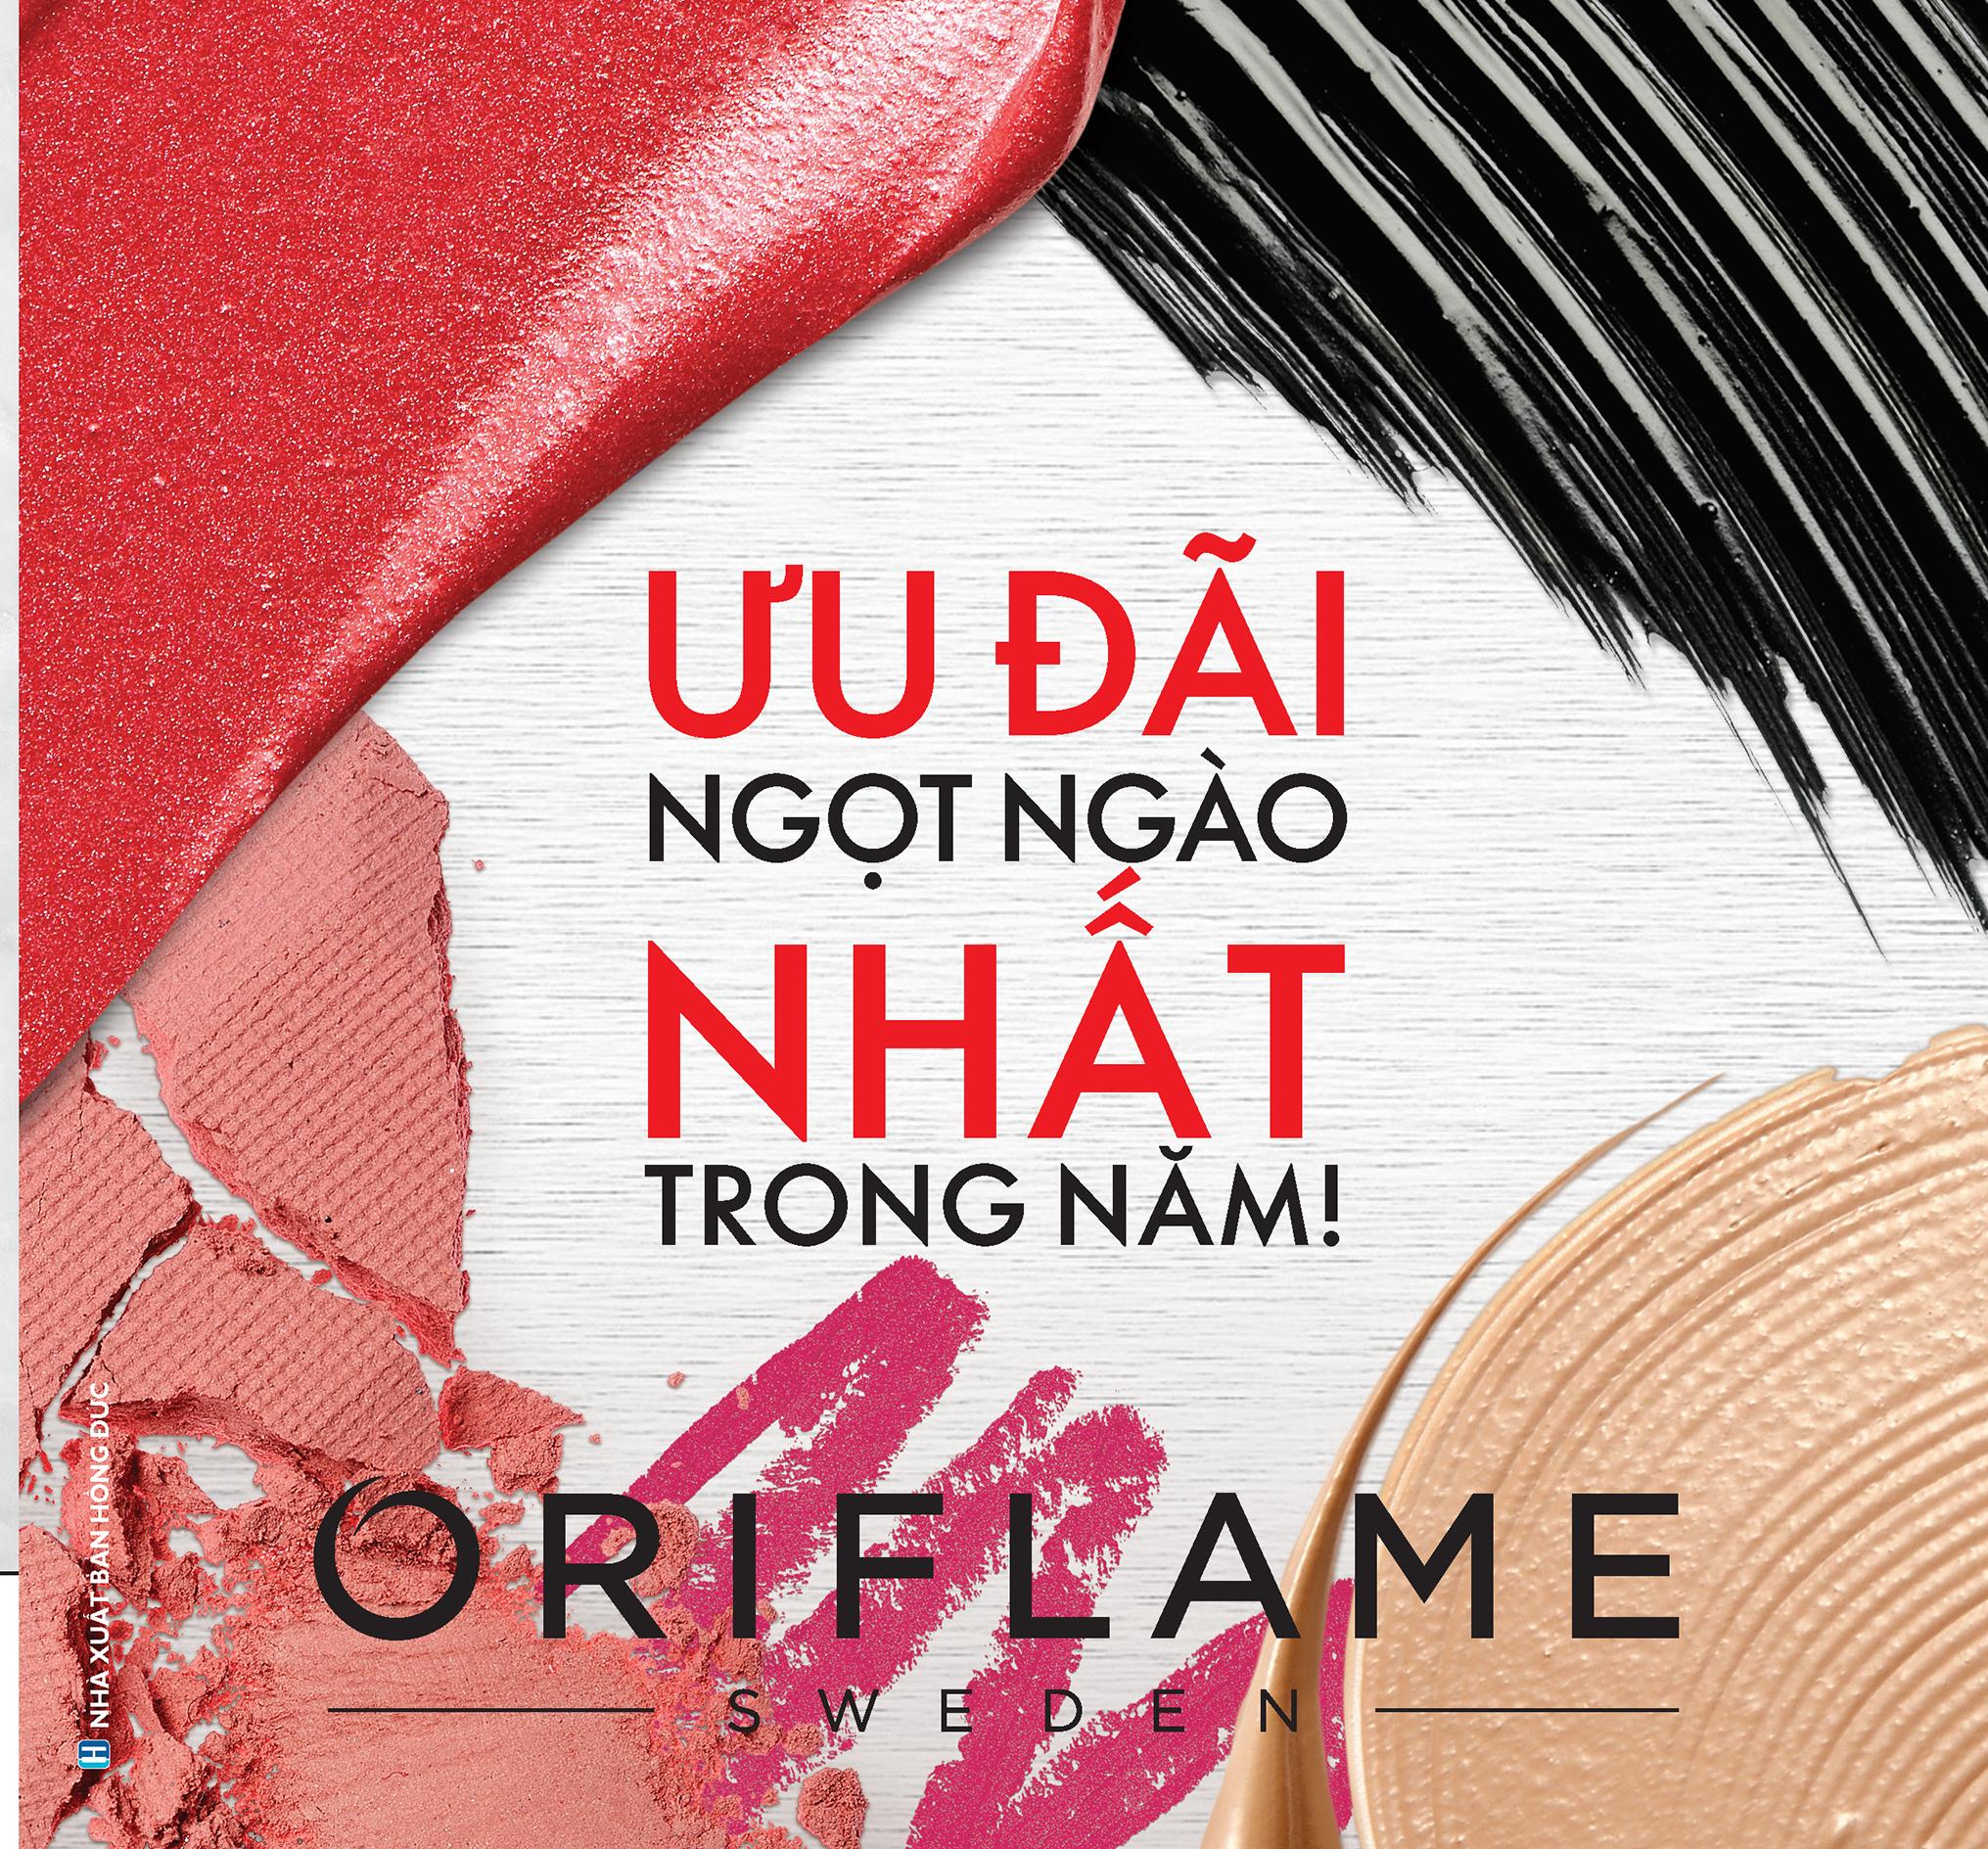 Catalogue mỹ phẩm Oriflame 7-2020